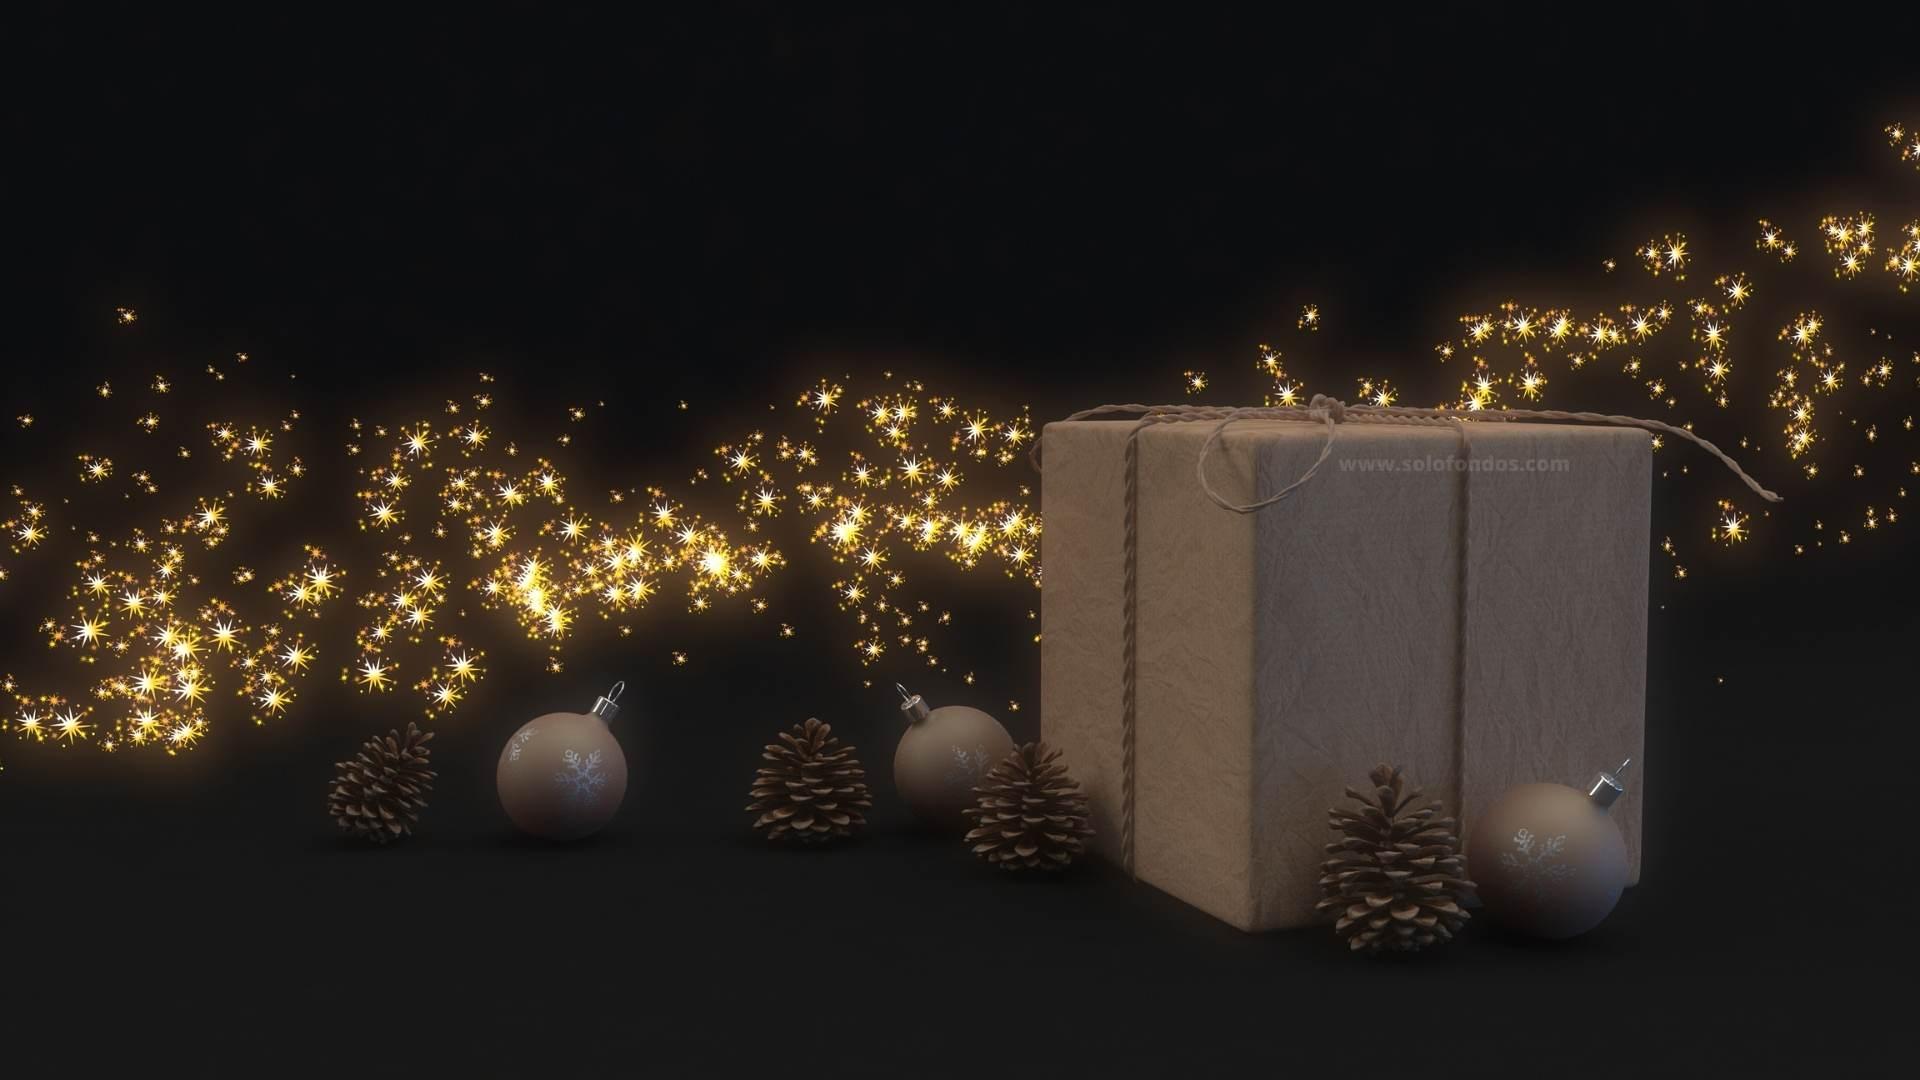 fondos animados navidad gratis